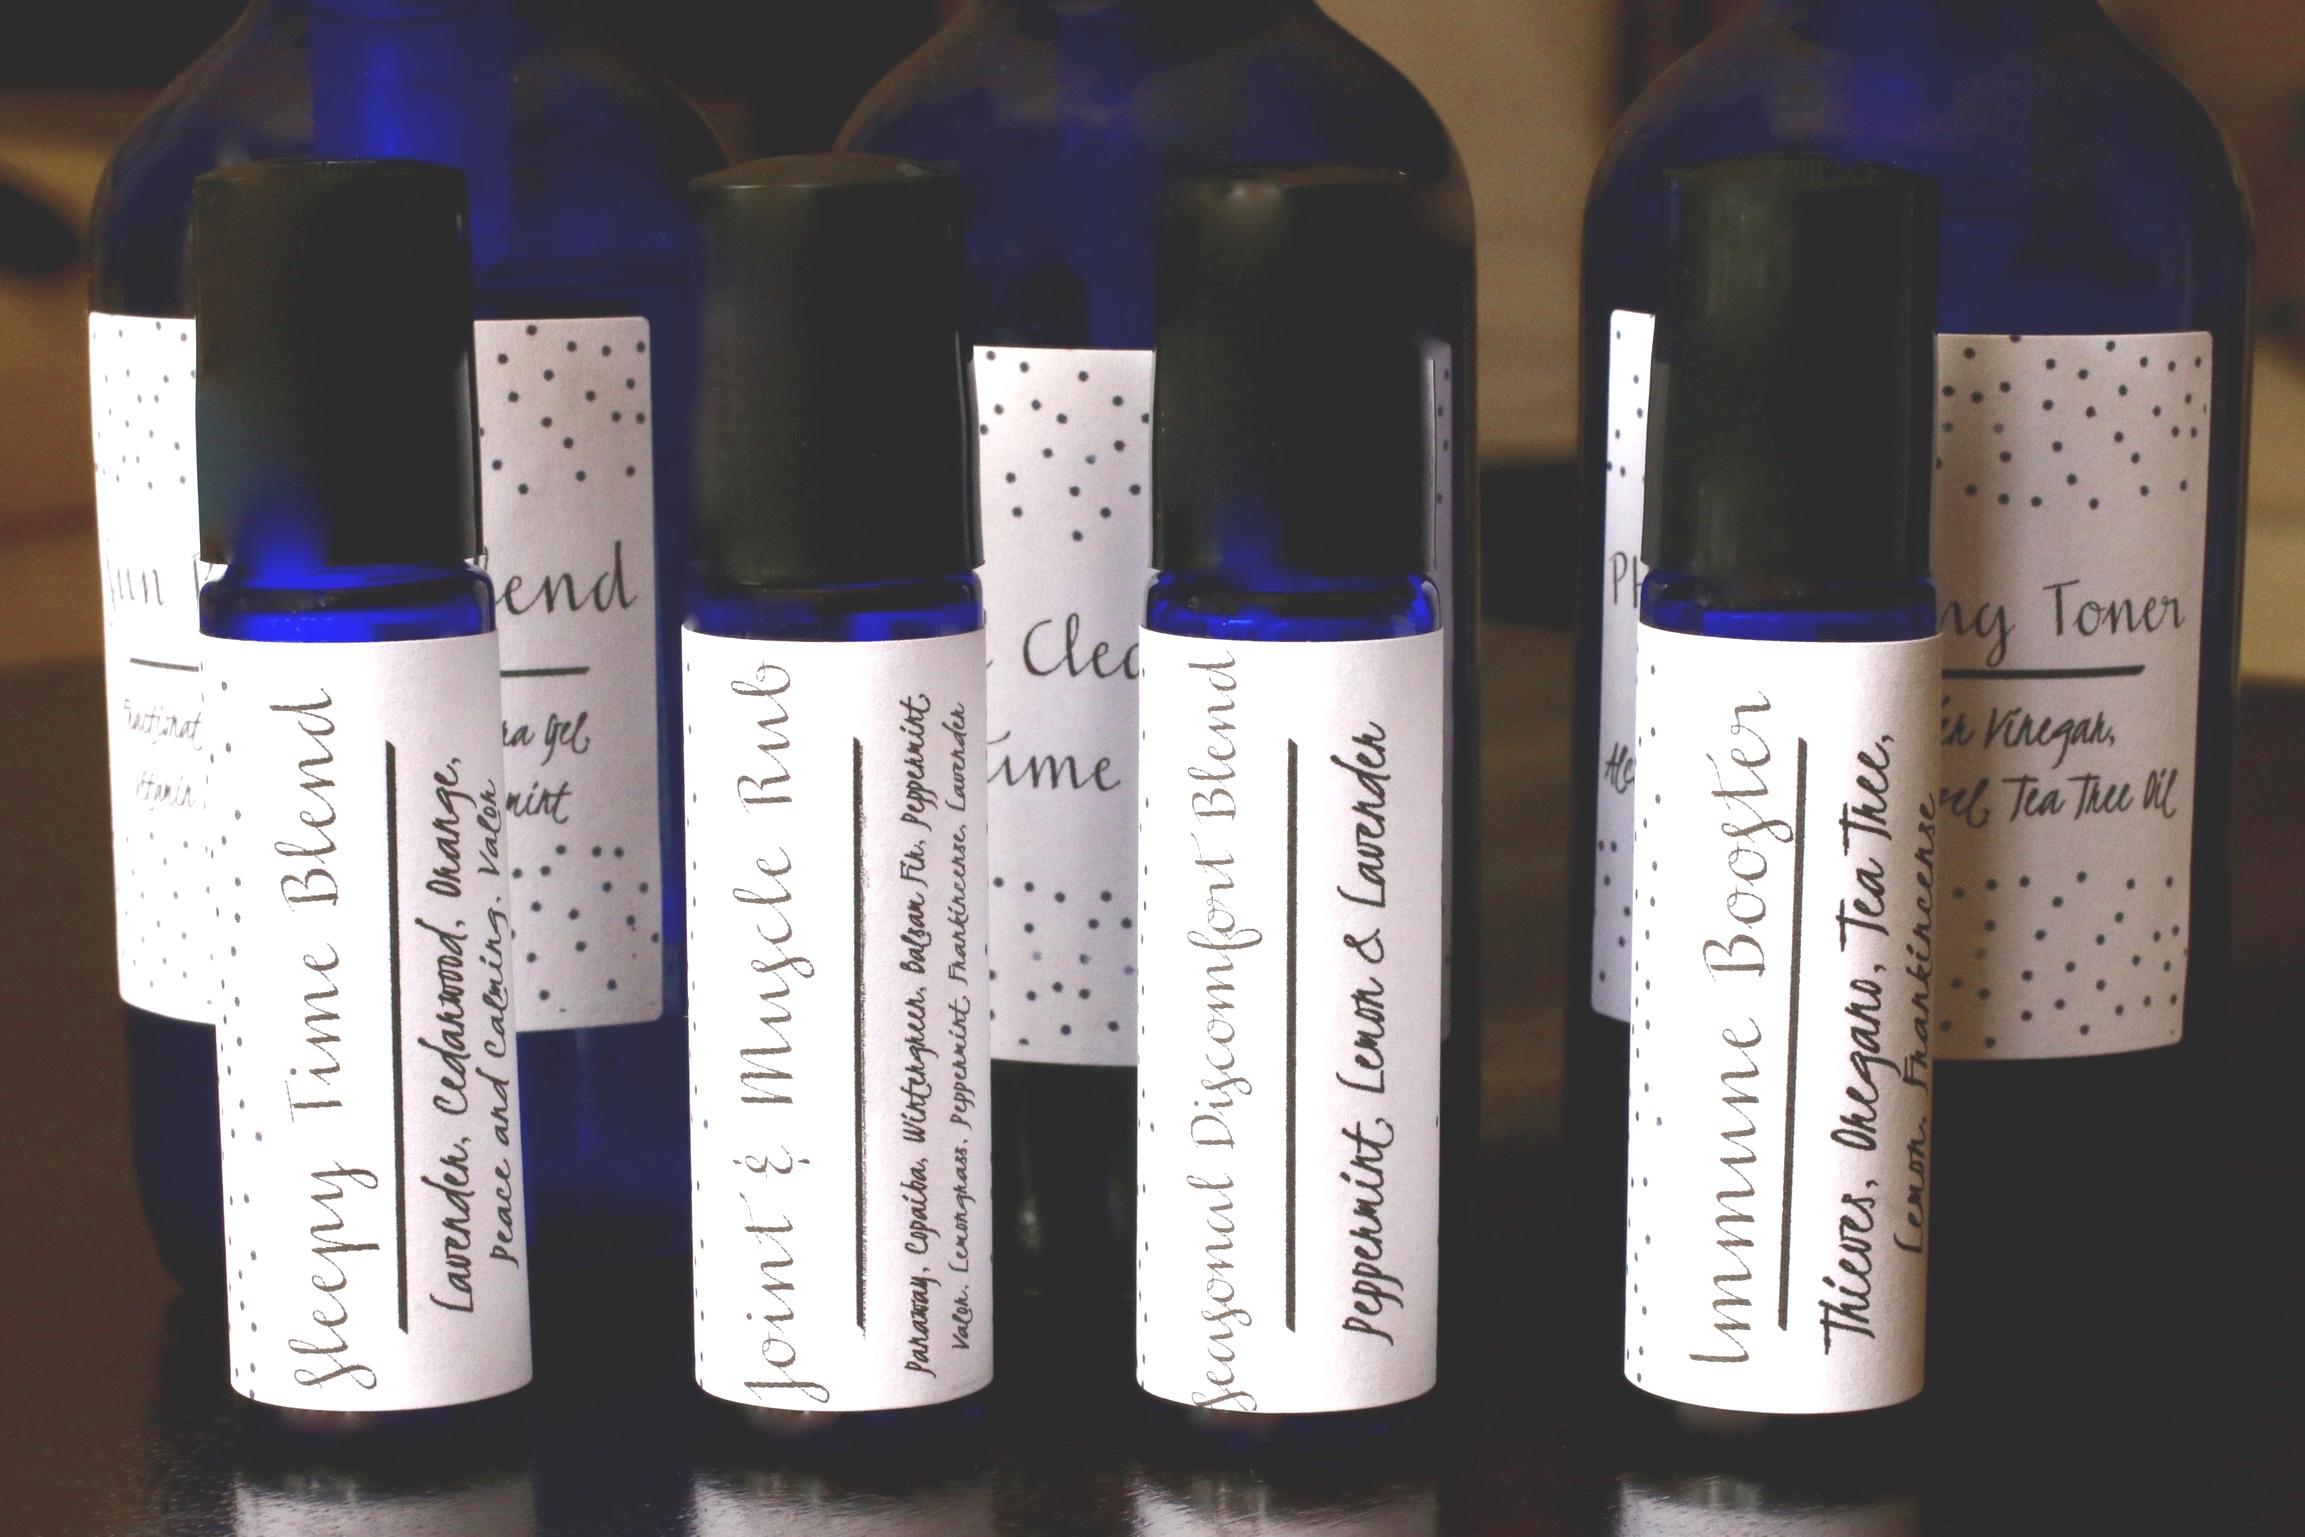 Top 5 Essential for Essential Oils | www.healthymamaspace.com